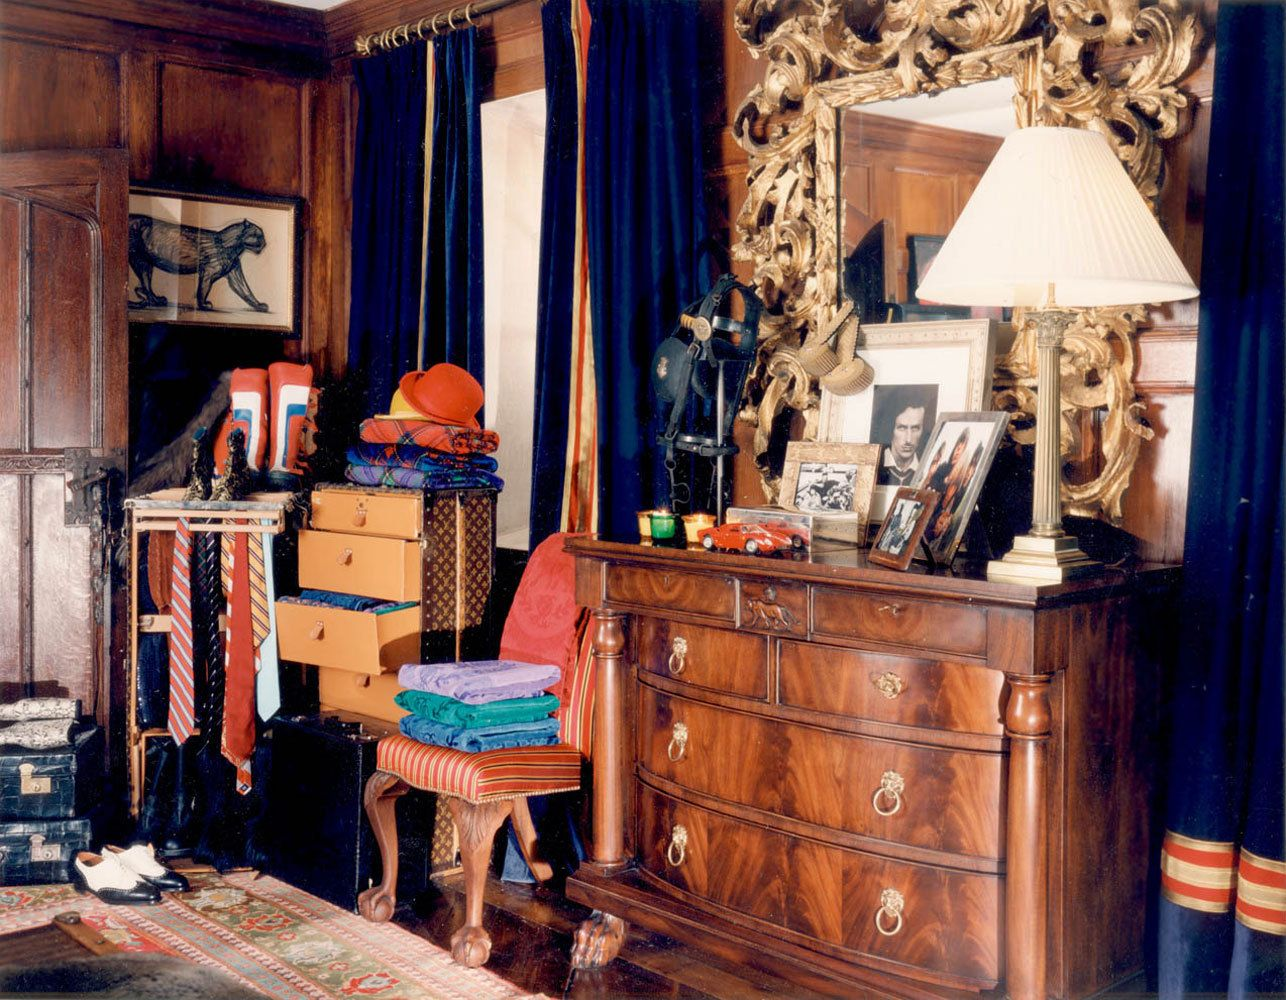 1ralph_lauren_home_furnishings_showroom_0087.jpg